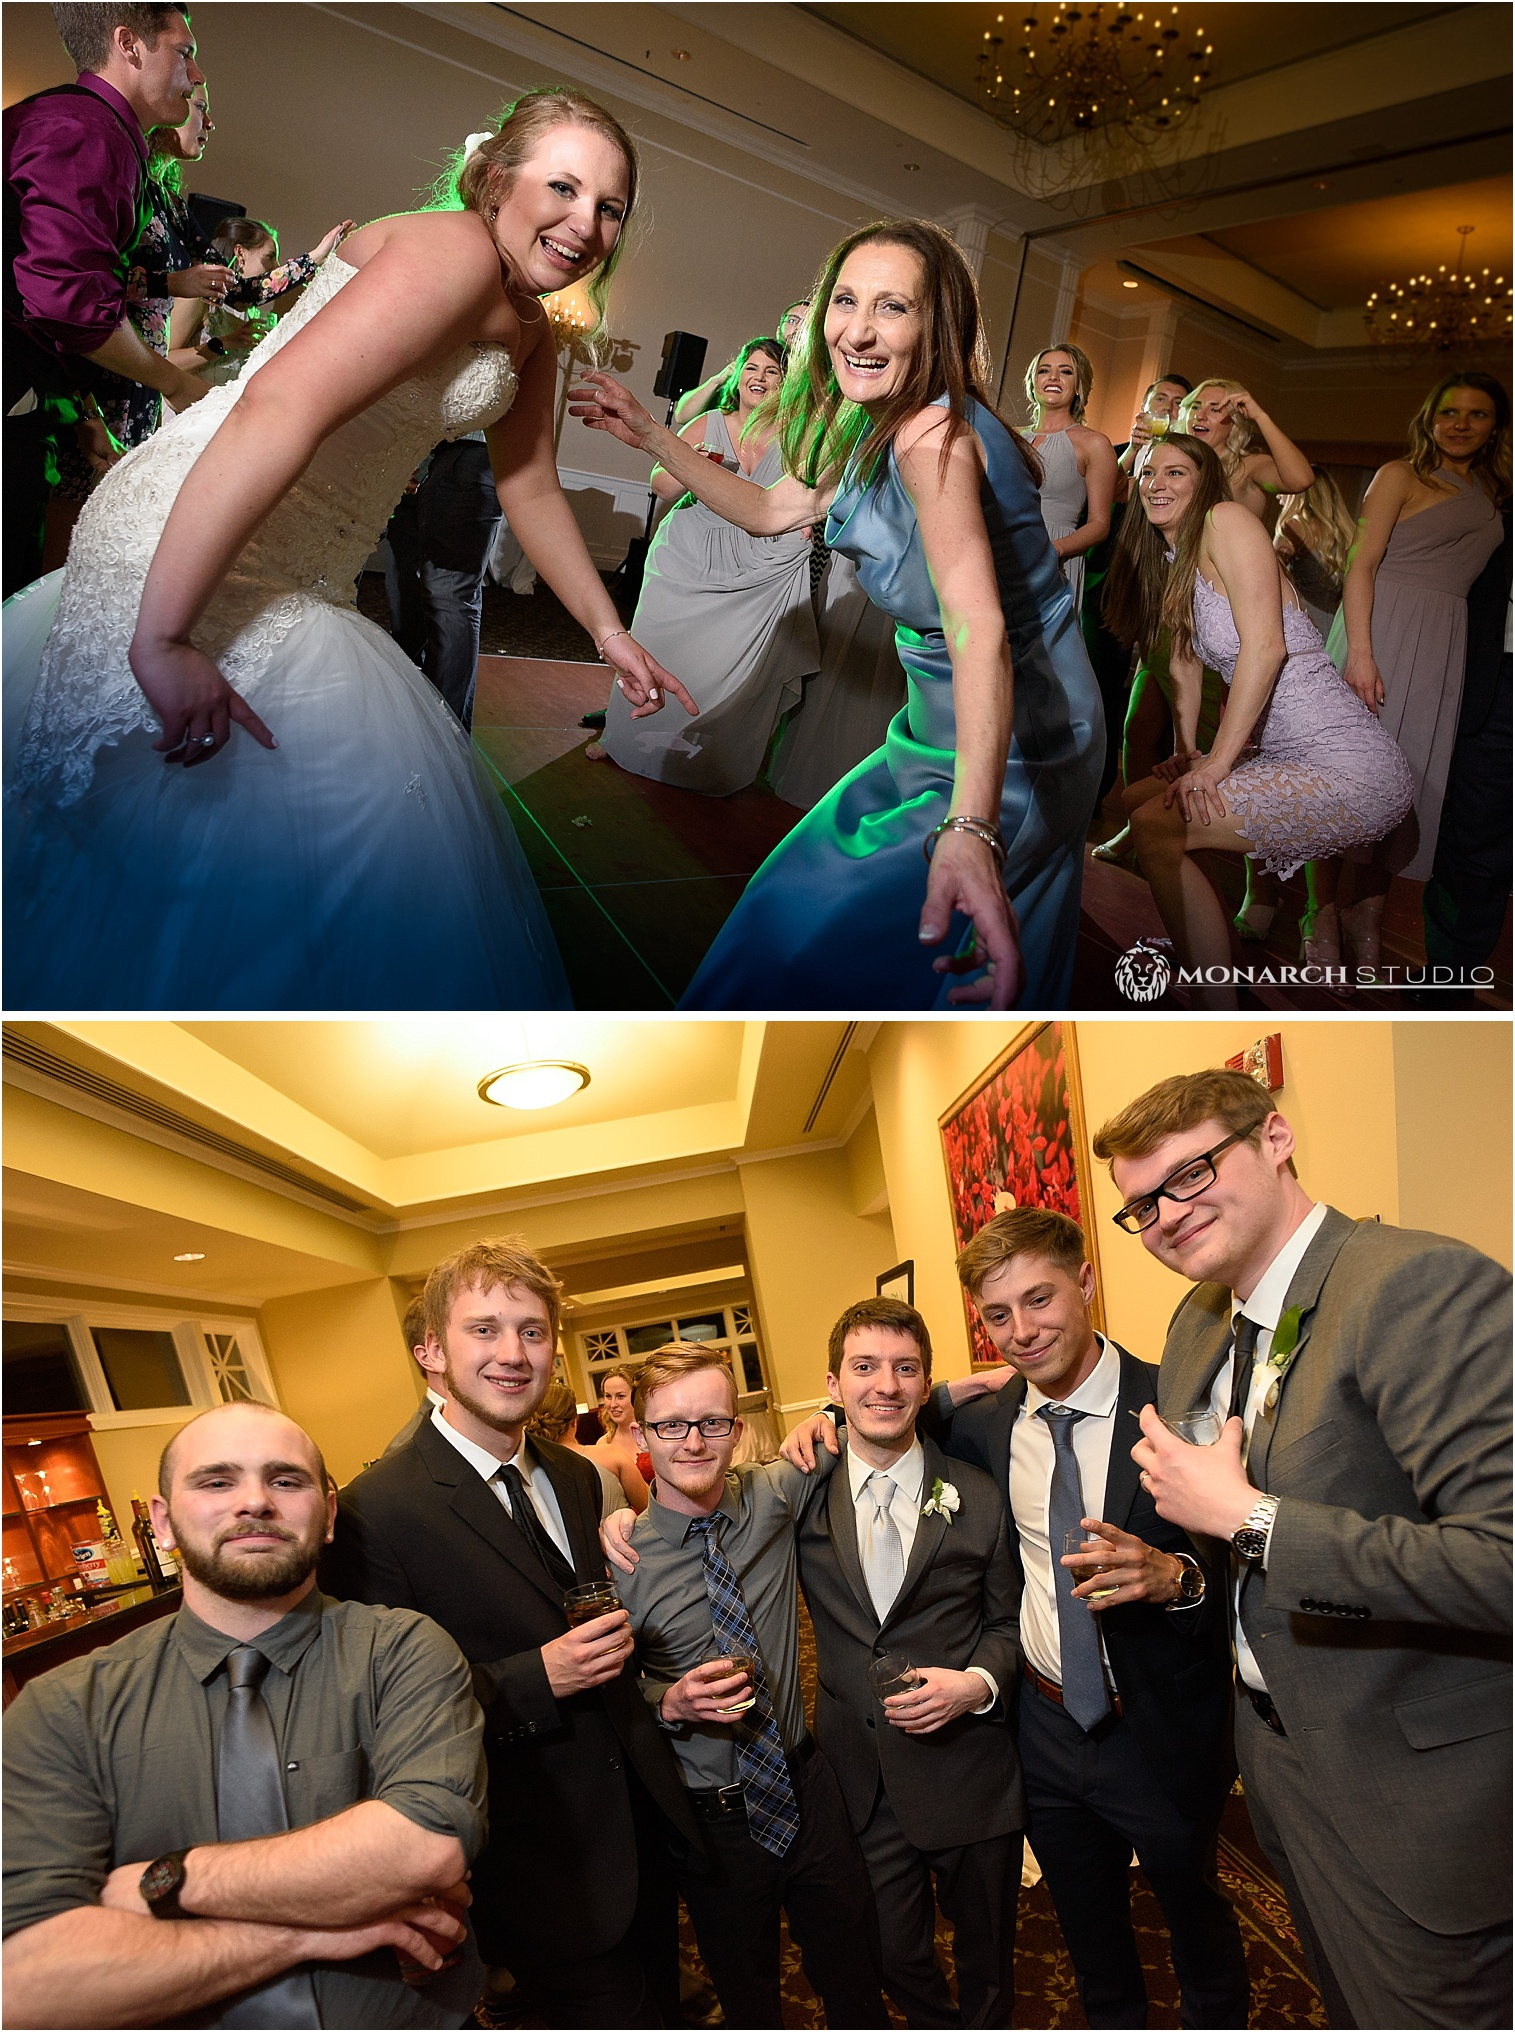 williamsburg-virginia-wedding-photographer-144.jpg